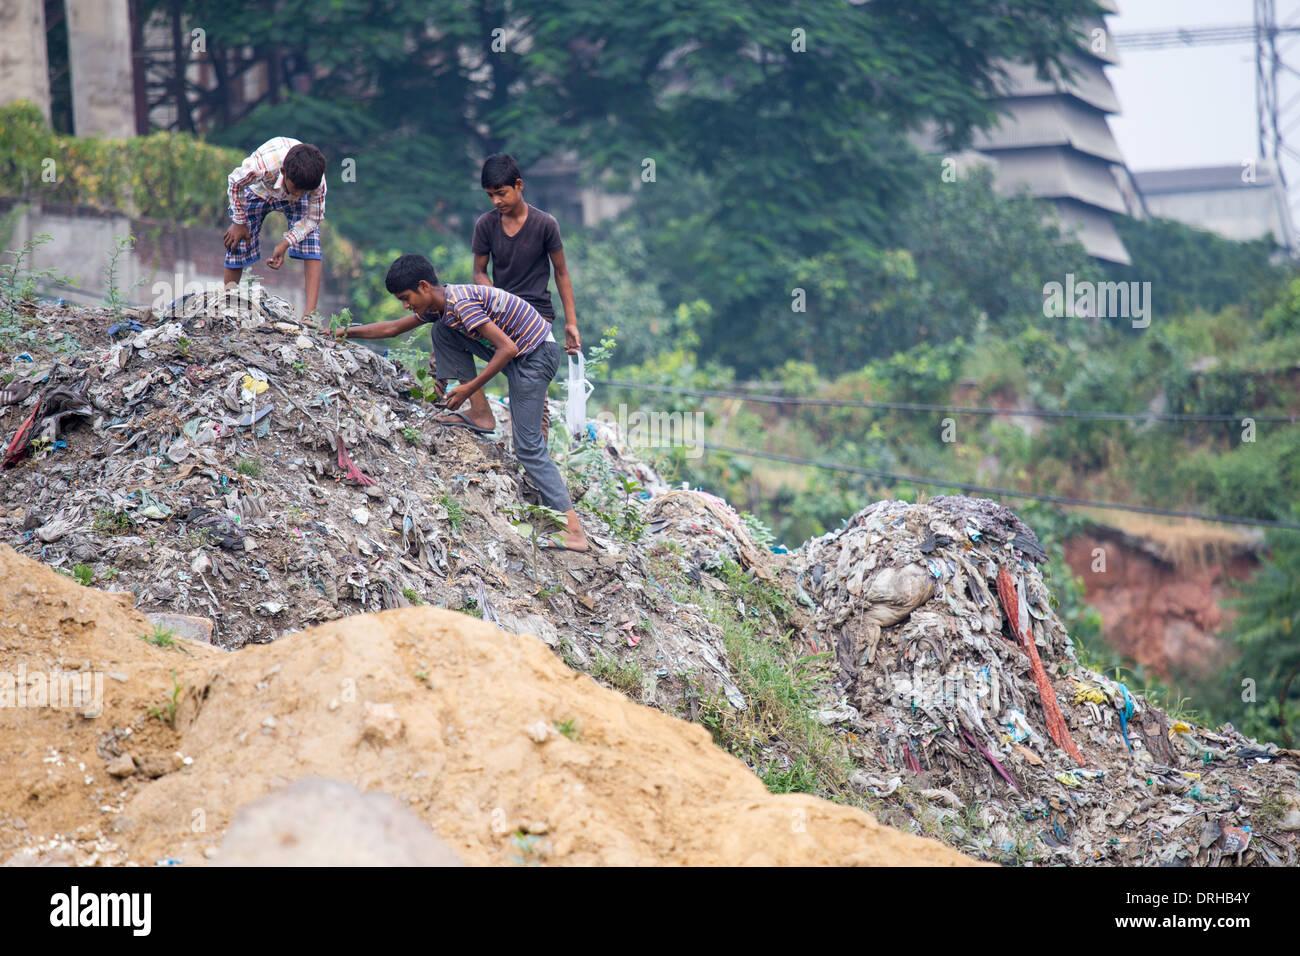 Boys picking through a landfill in Delhi, India - Stock Image